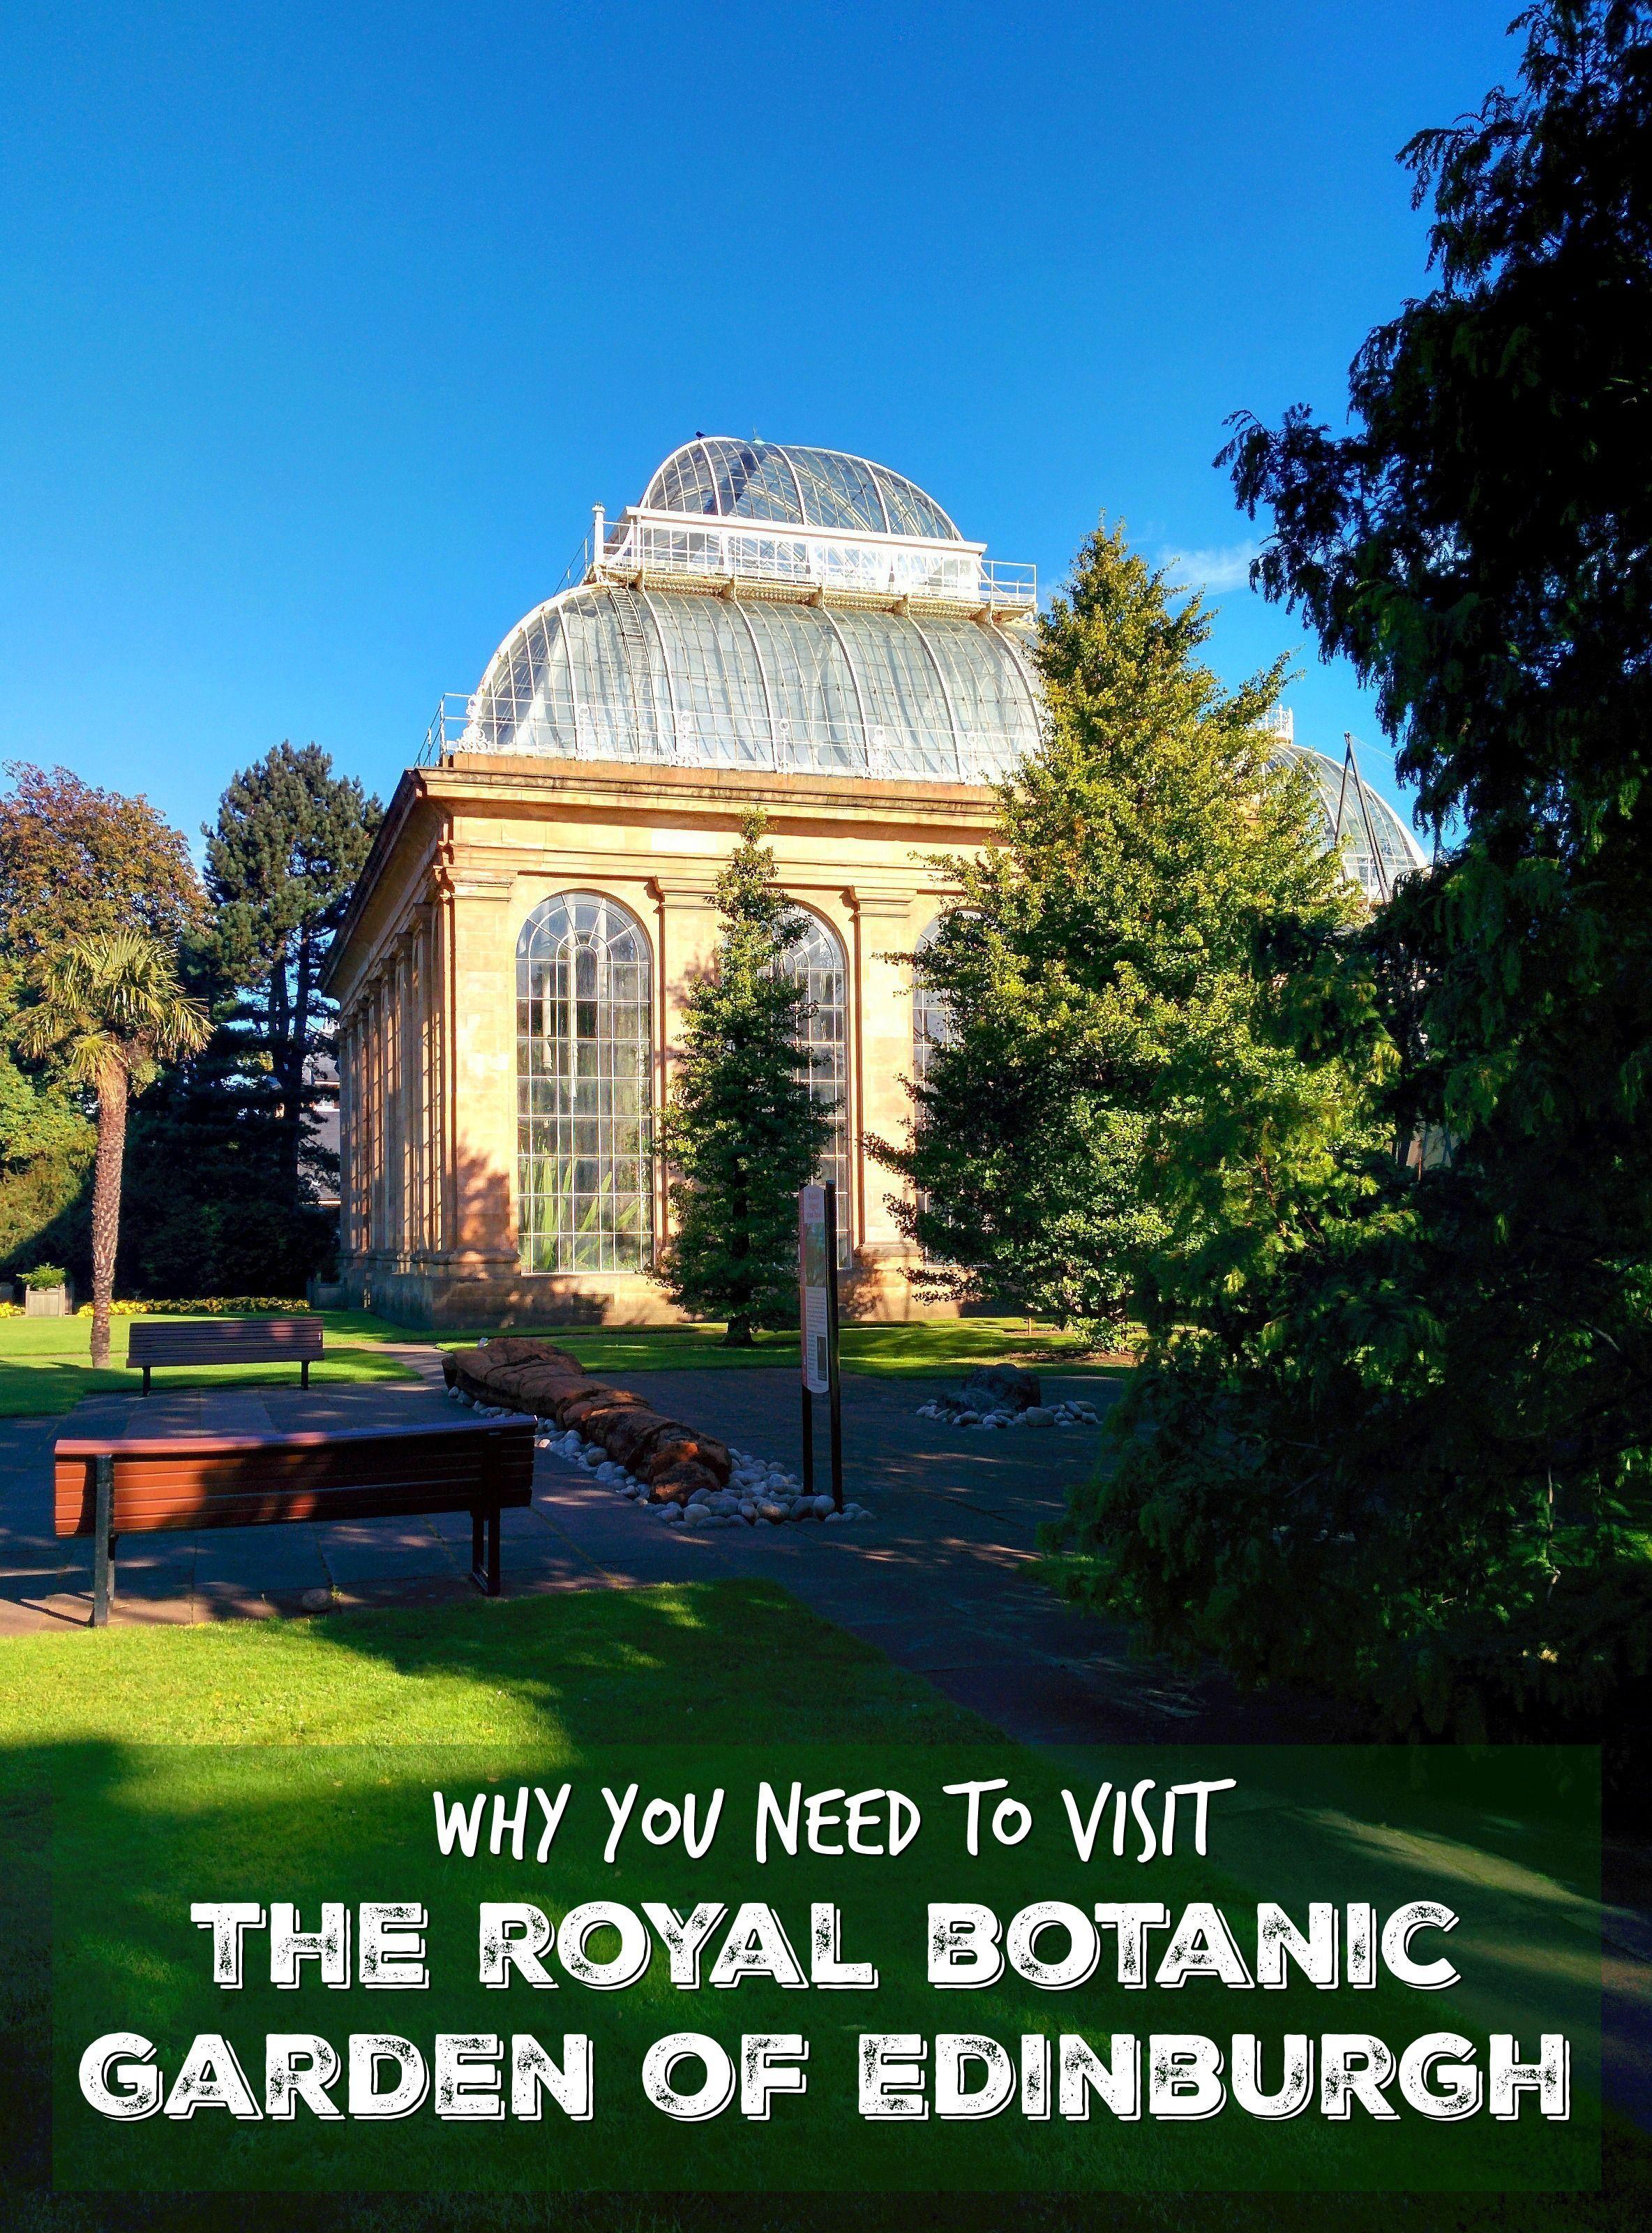 bdbc63805756c451ae3e15b6621a5d5c - Places To Eat Near Botanic Gardens Edinburgh